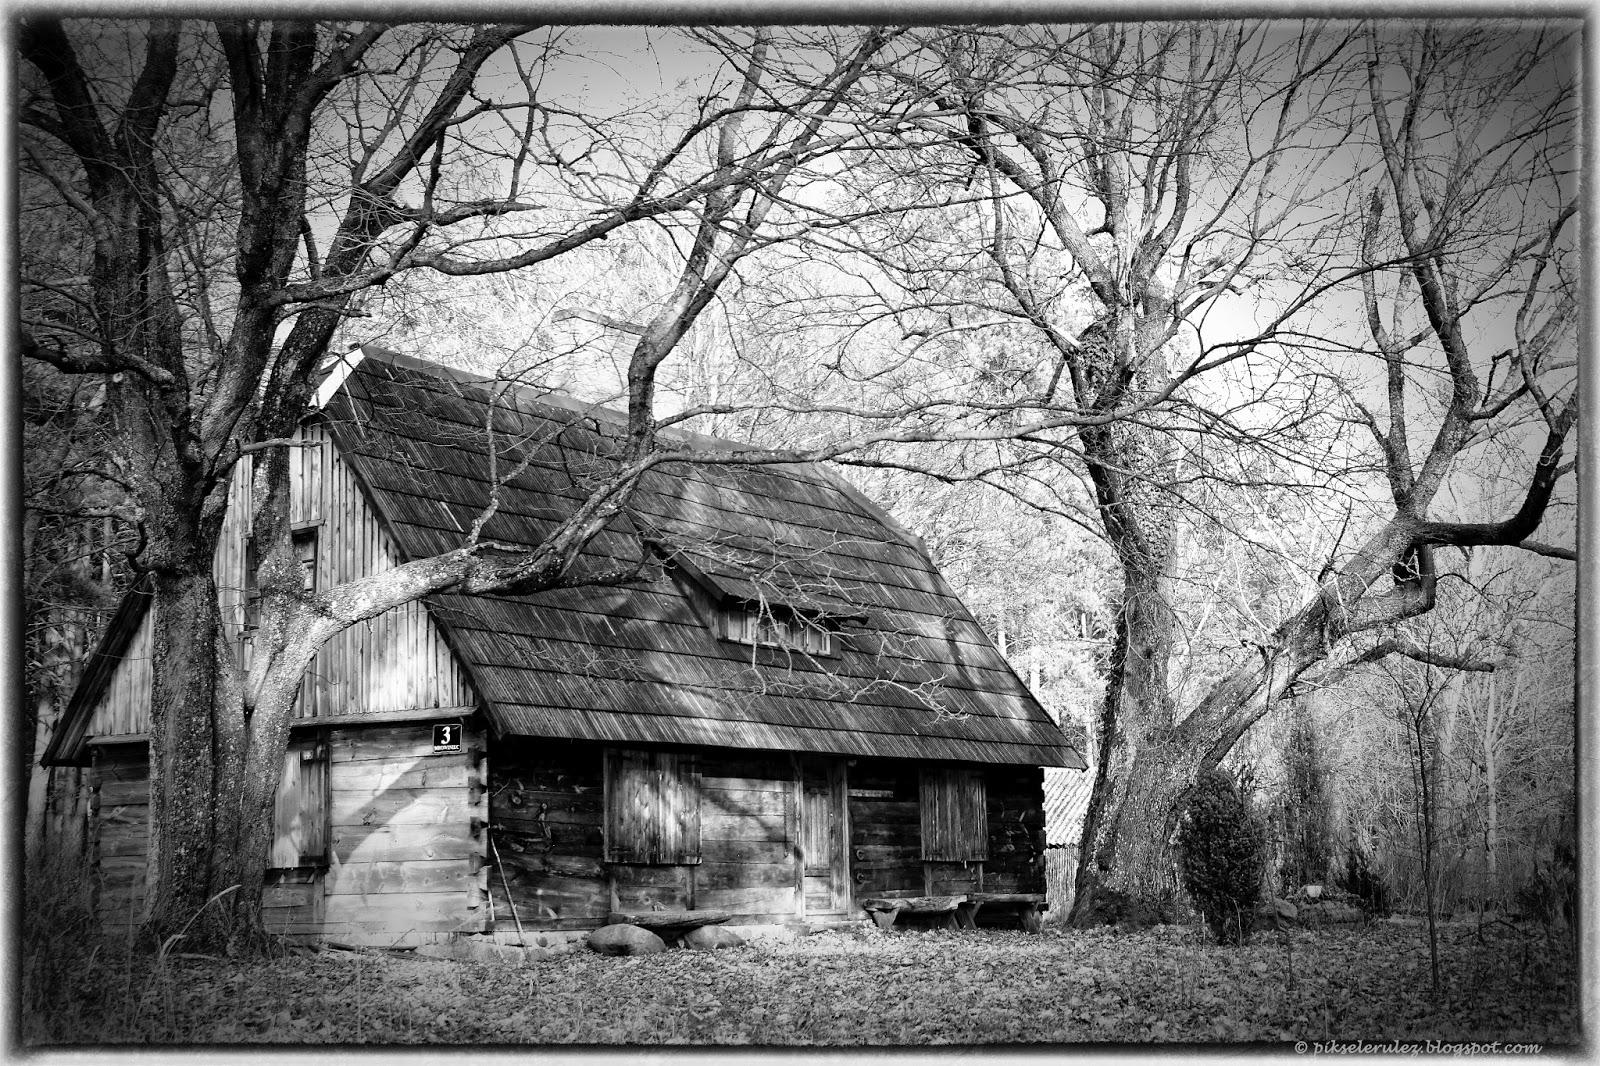 chatka, bory tucholskie, drzewa, drewniana chata